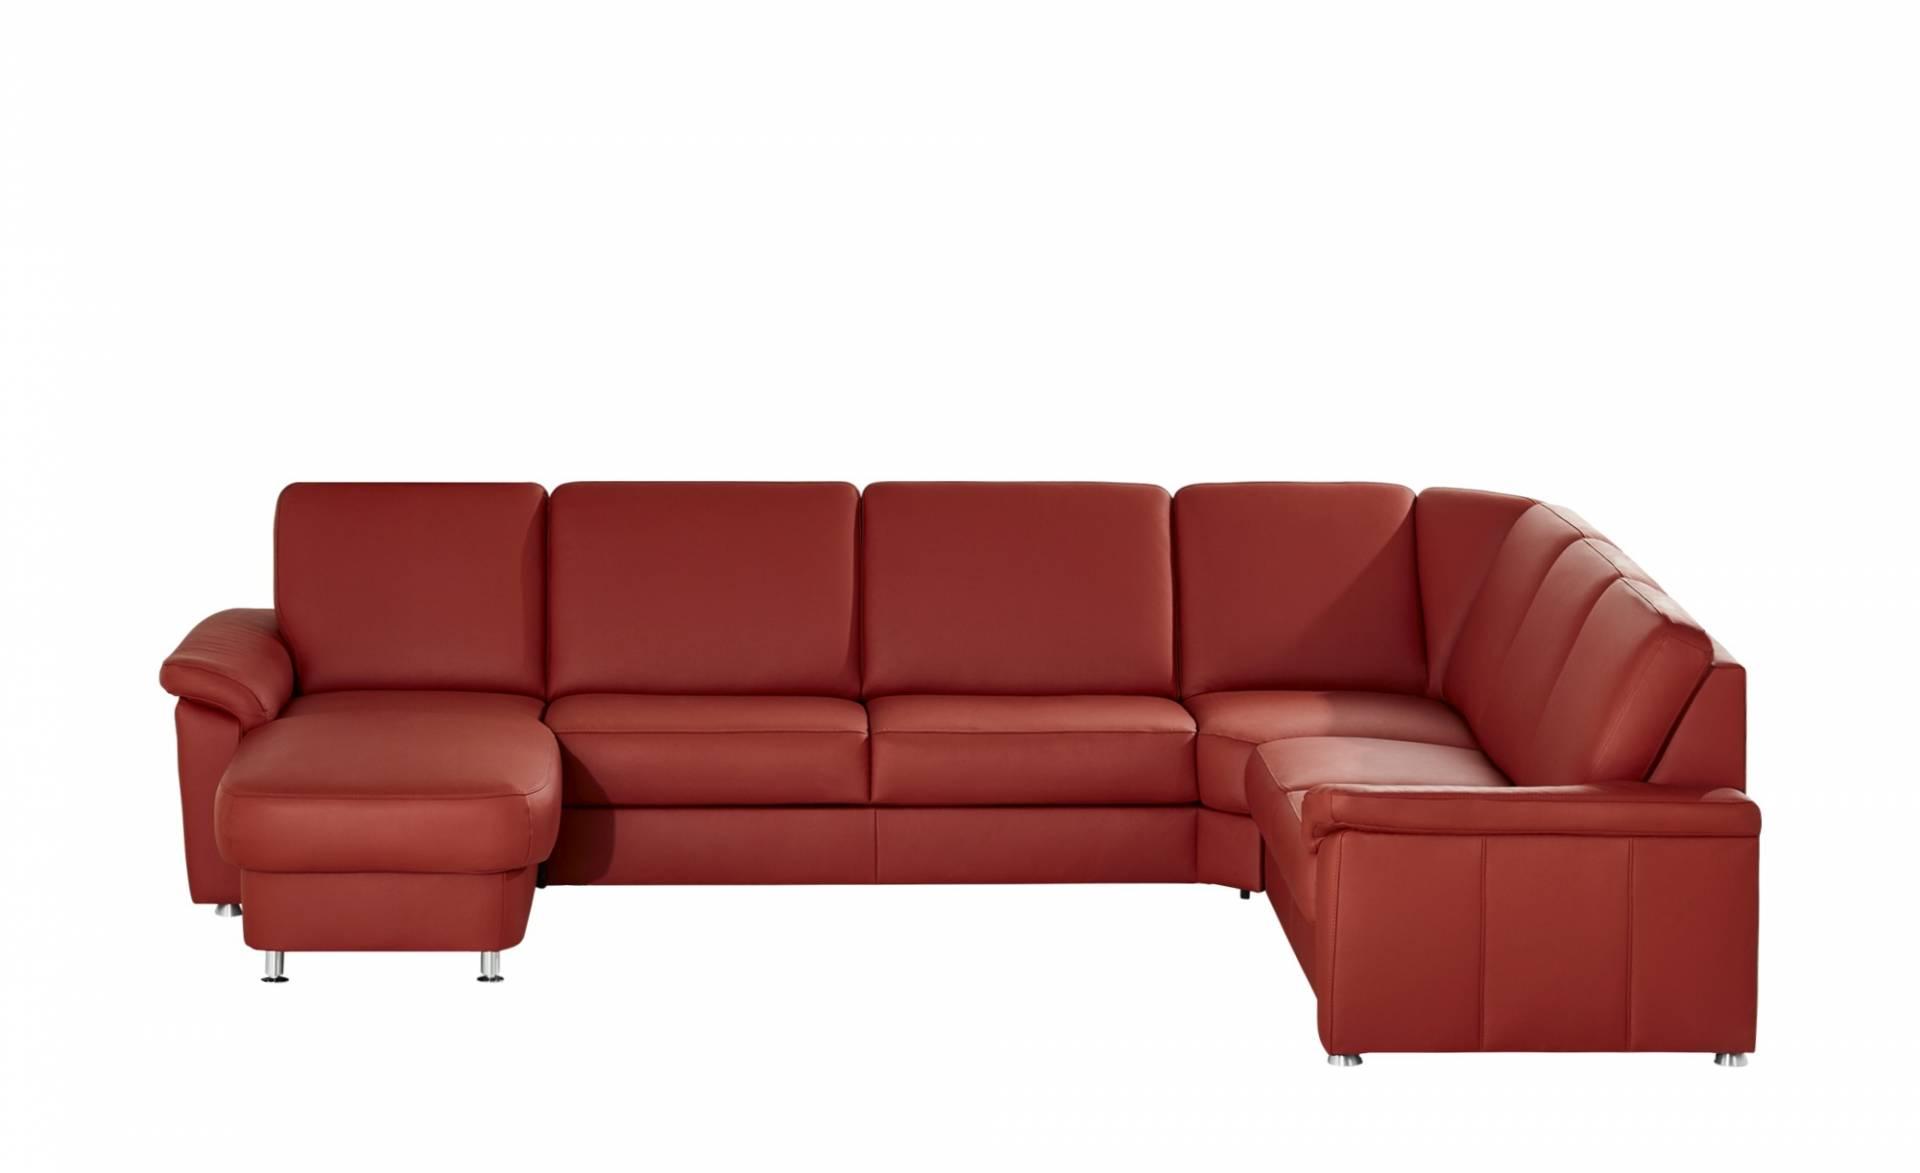 rot wohnlandschaften aus leder und weitere ledersofas. Black Bedroom Furniture Sets. Home Design Ideas